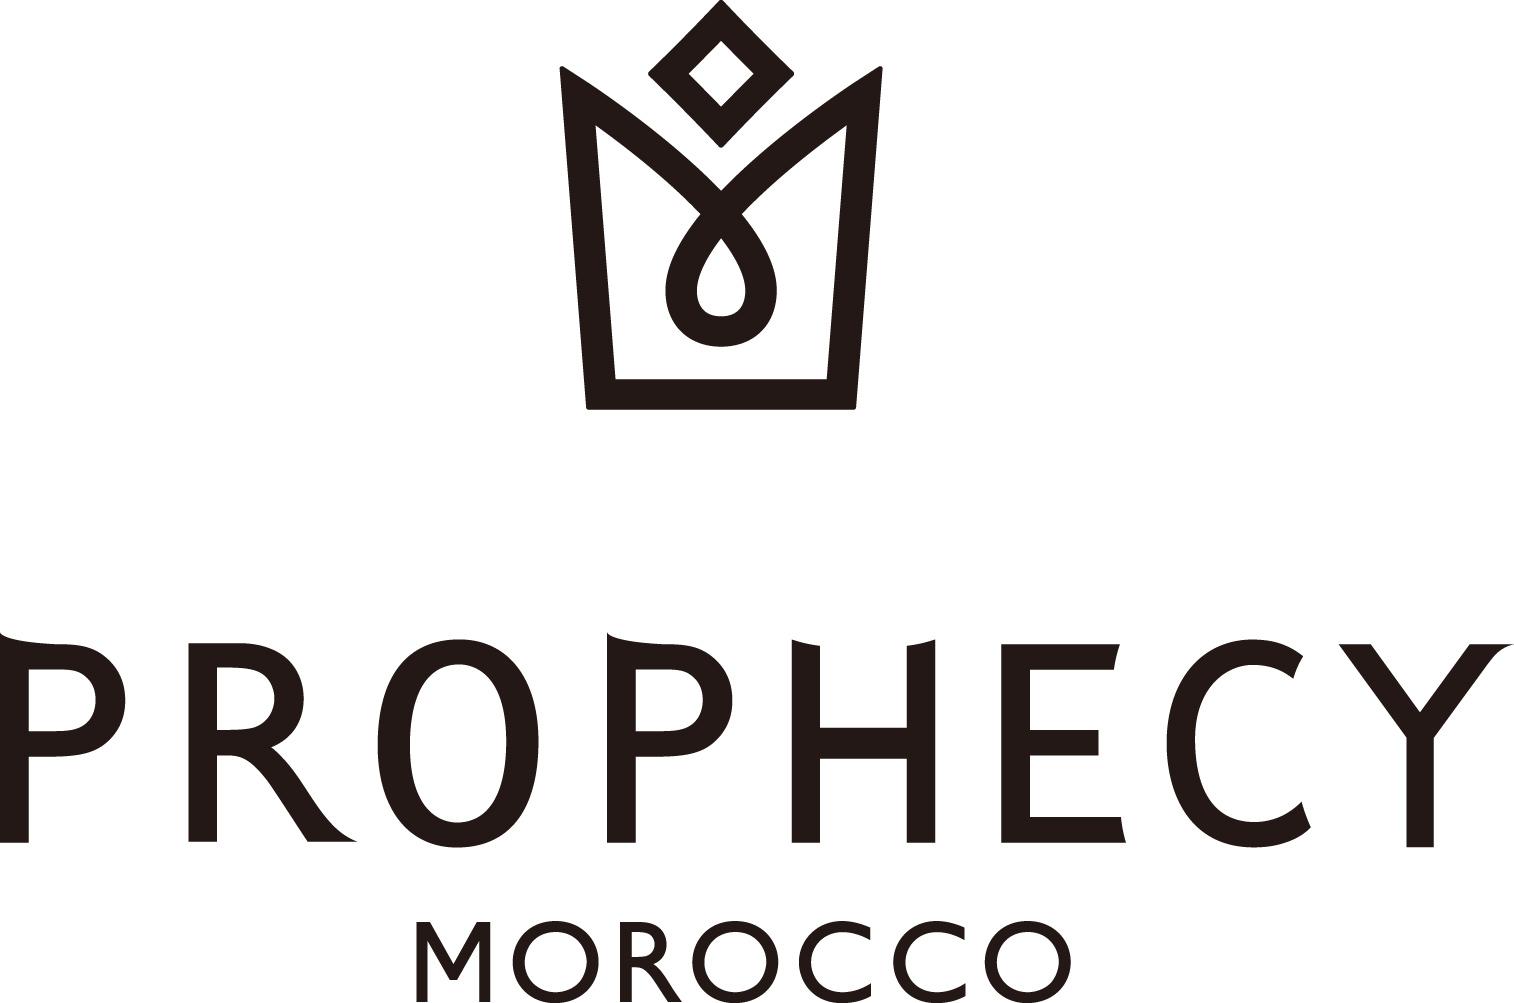 Prophecy Morocco 鉑翡斯